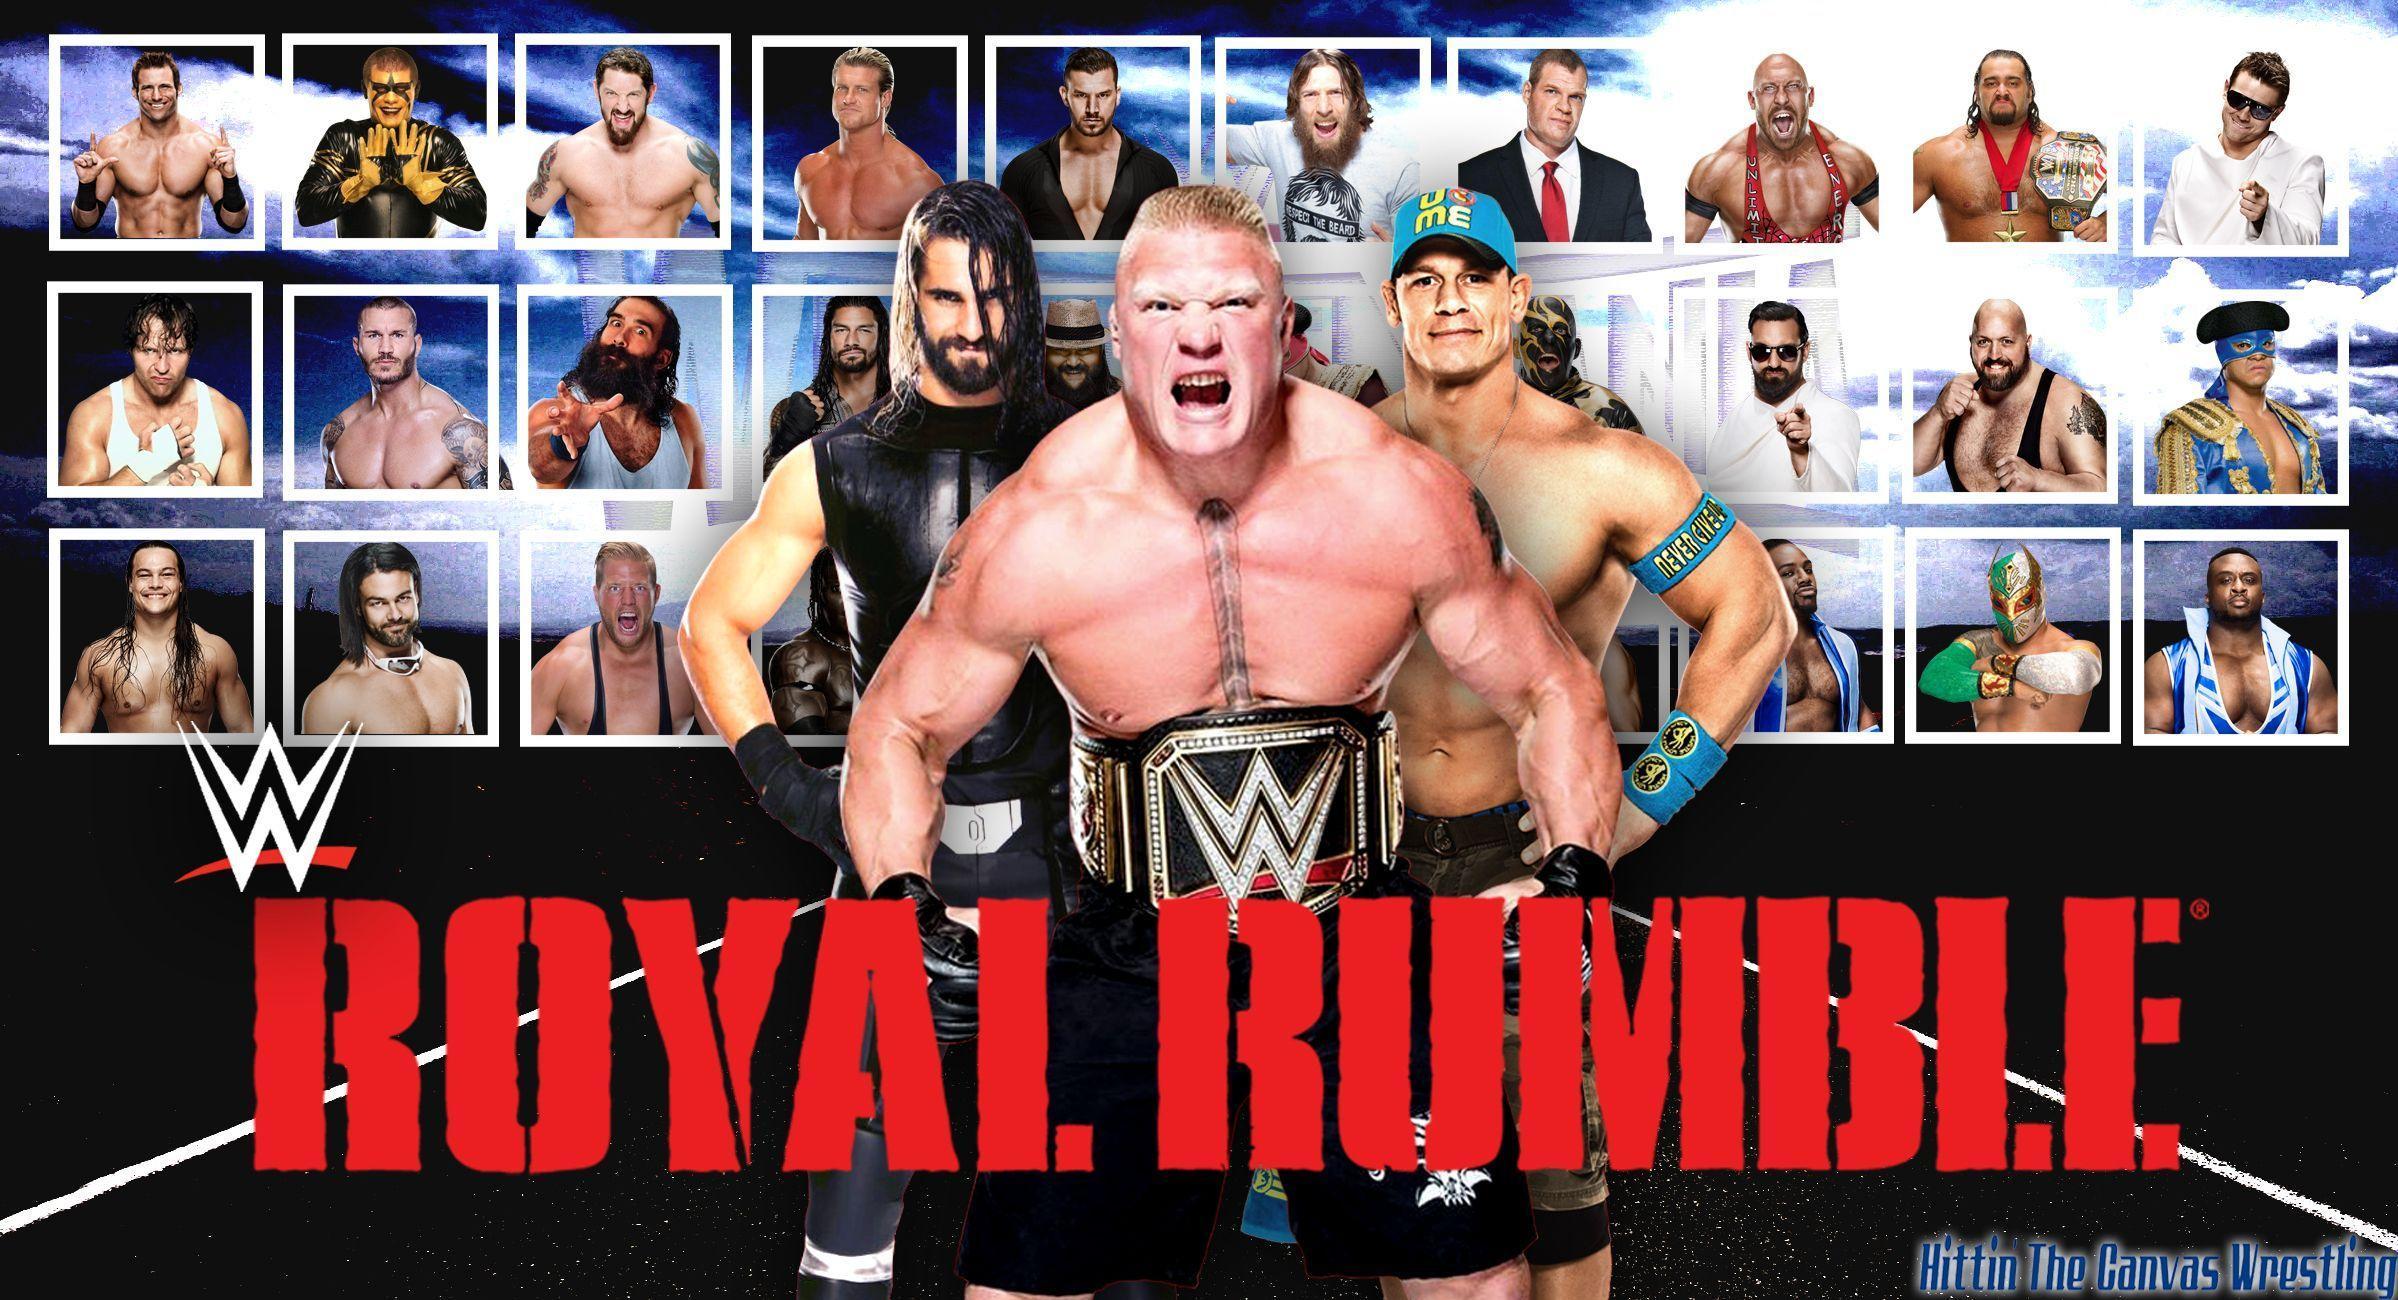 2015 WWE Royal Rumble Wallpaper | Hittin' The Canvas